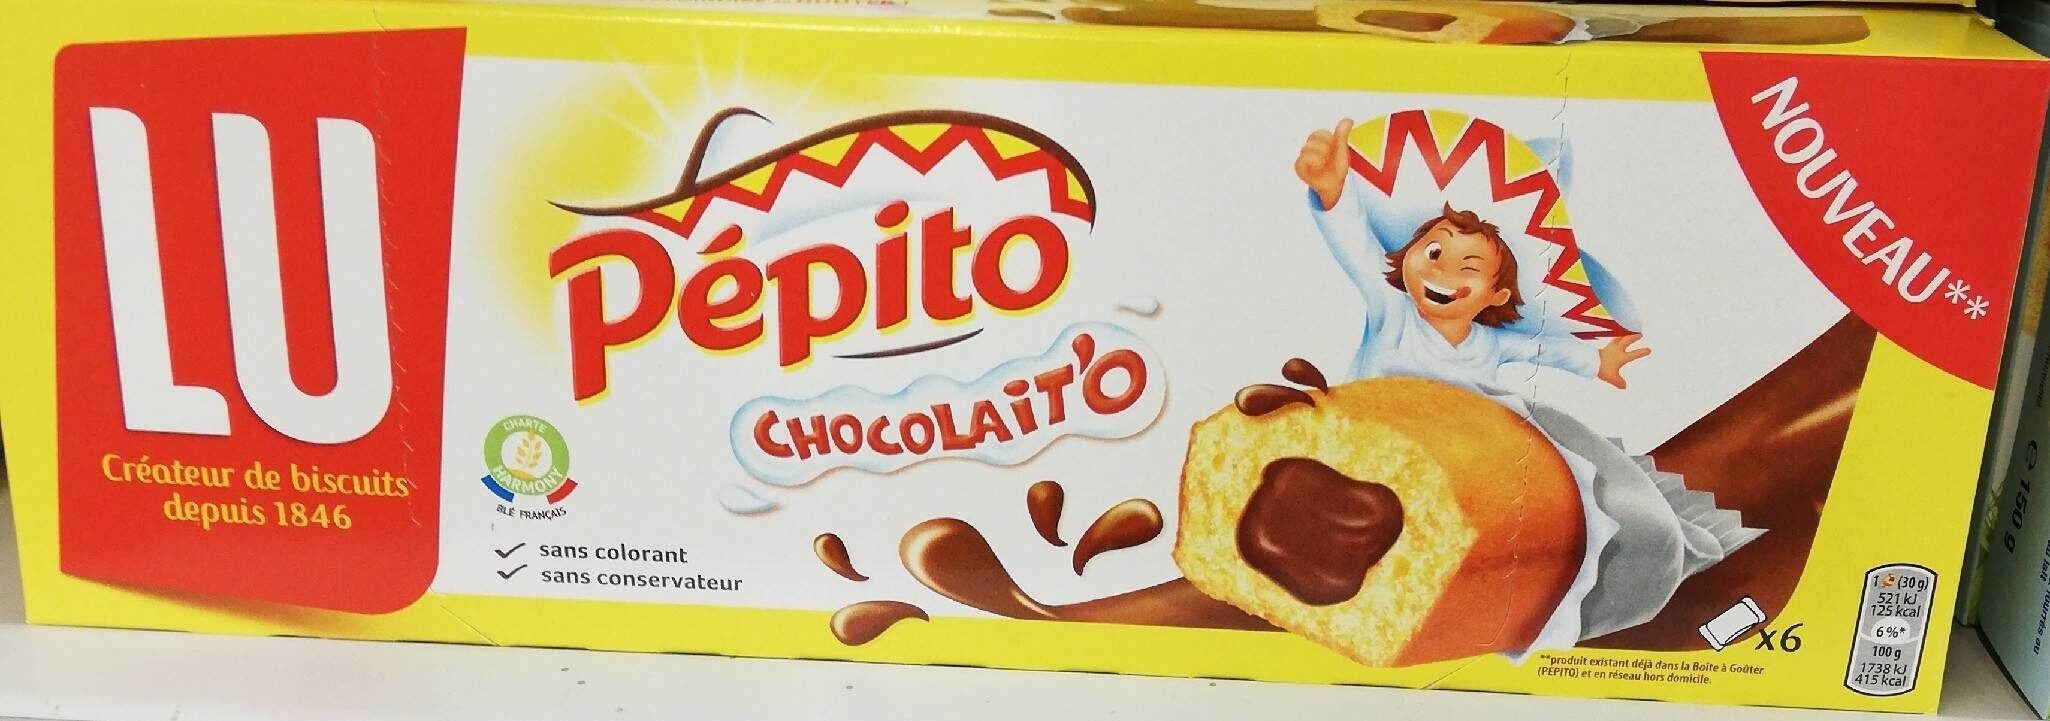 Pepito Chocolait'o - Produkt - fr